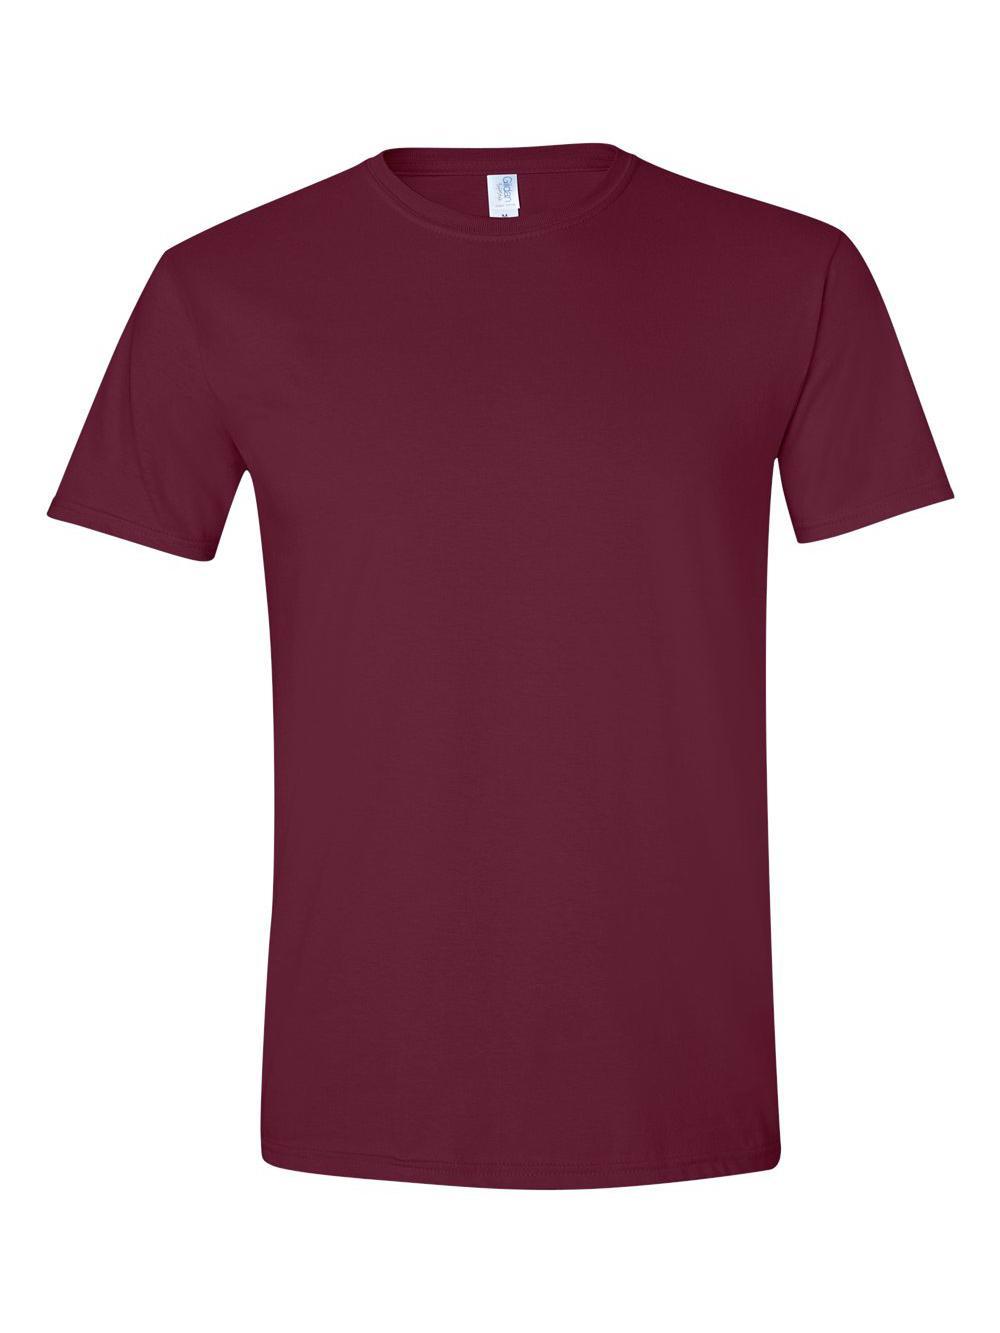 Gildan-Softstyle-T-Shirt-64000 thumbnail 126